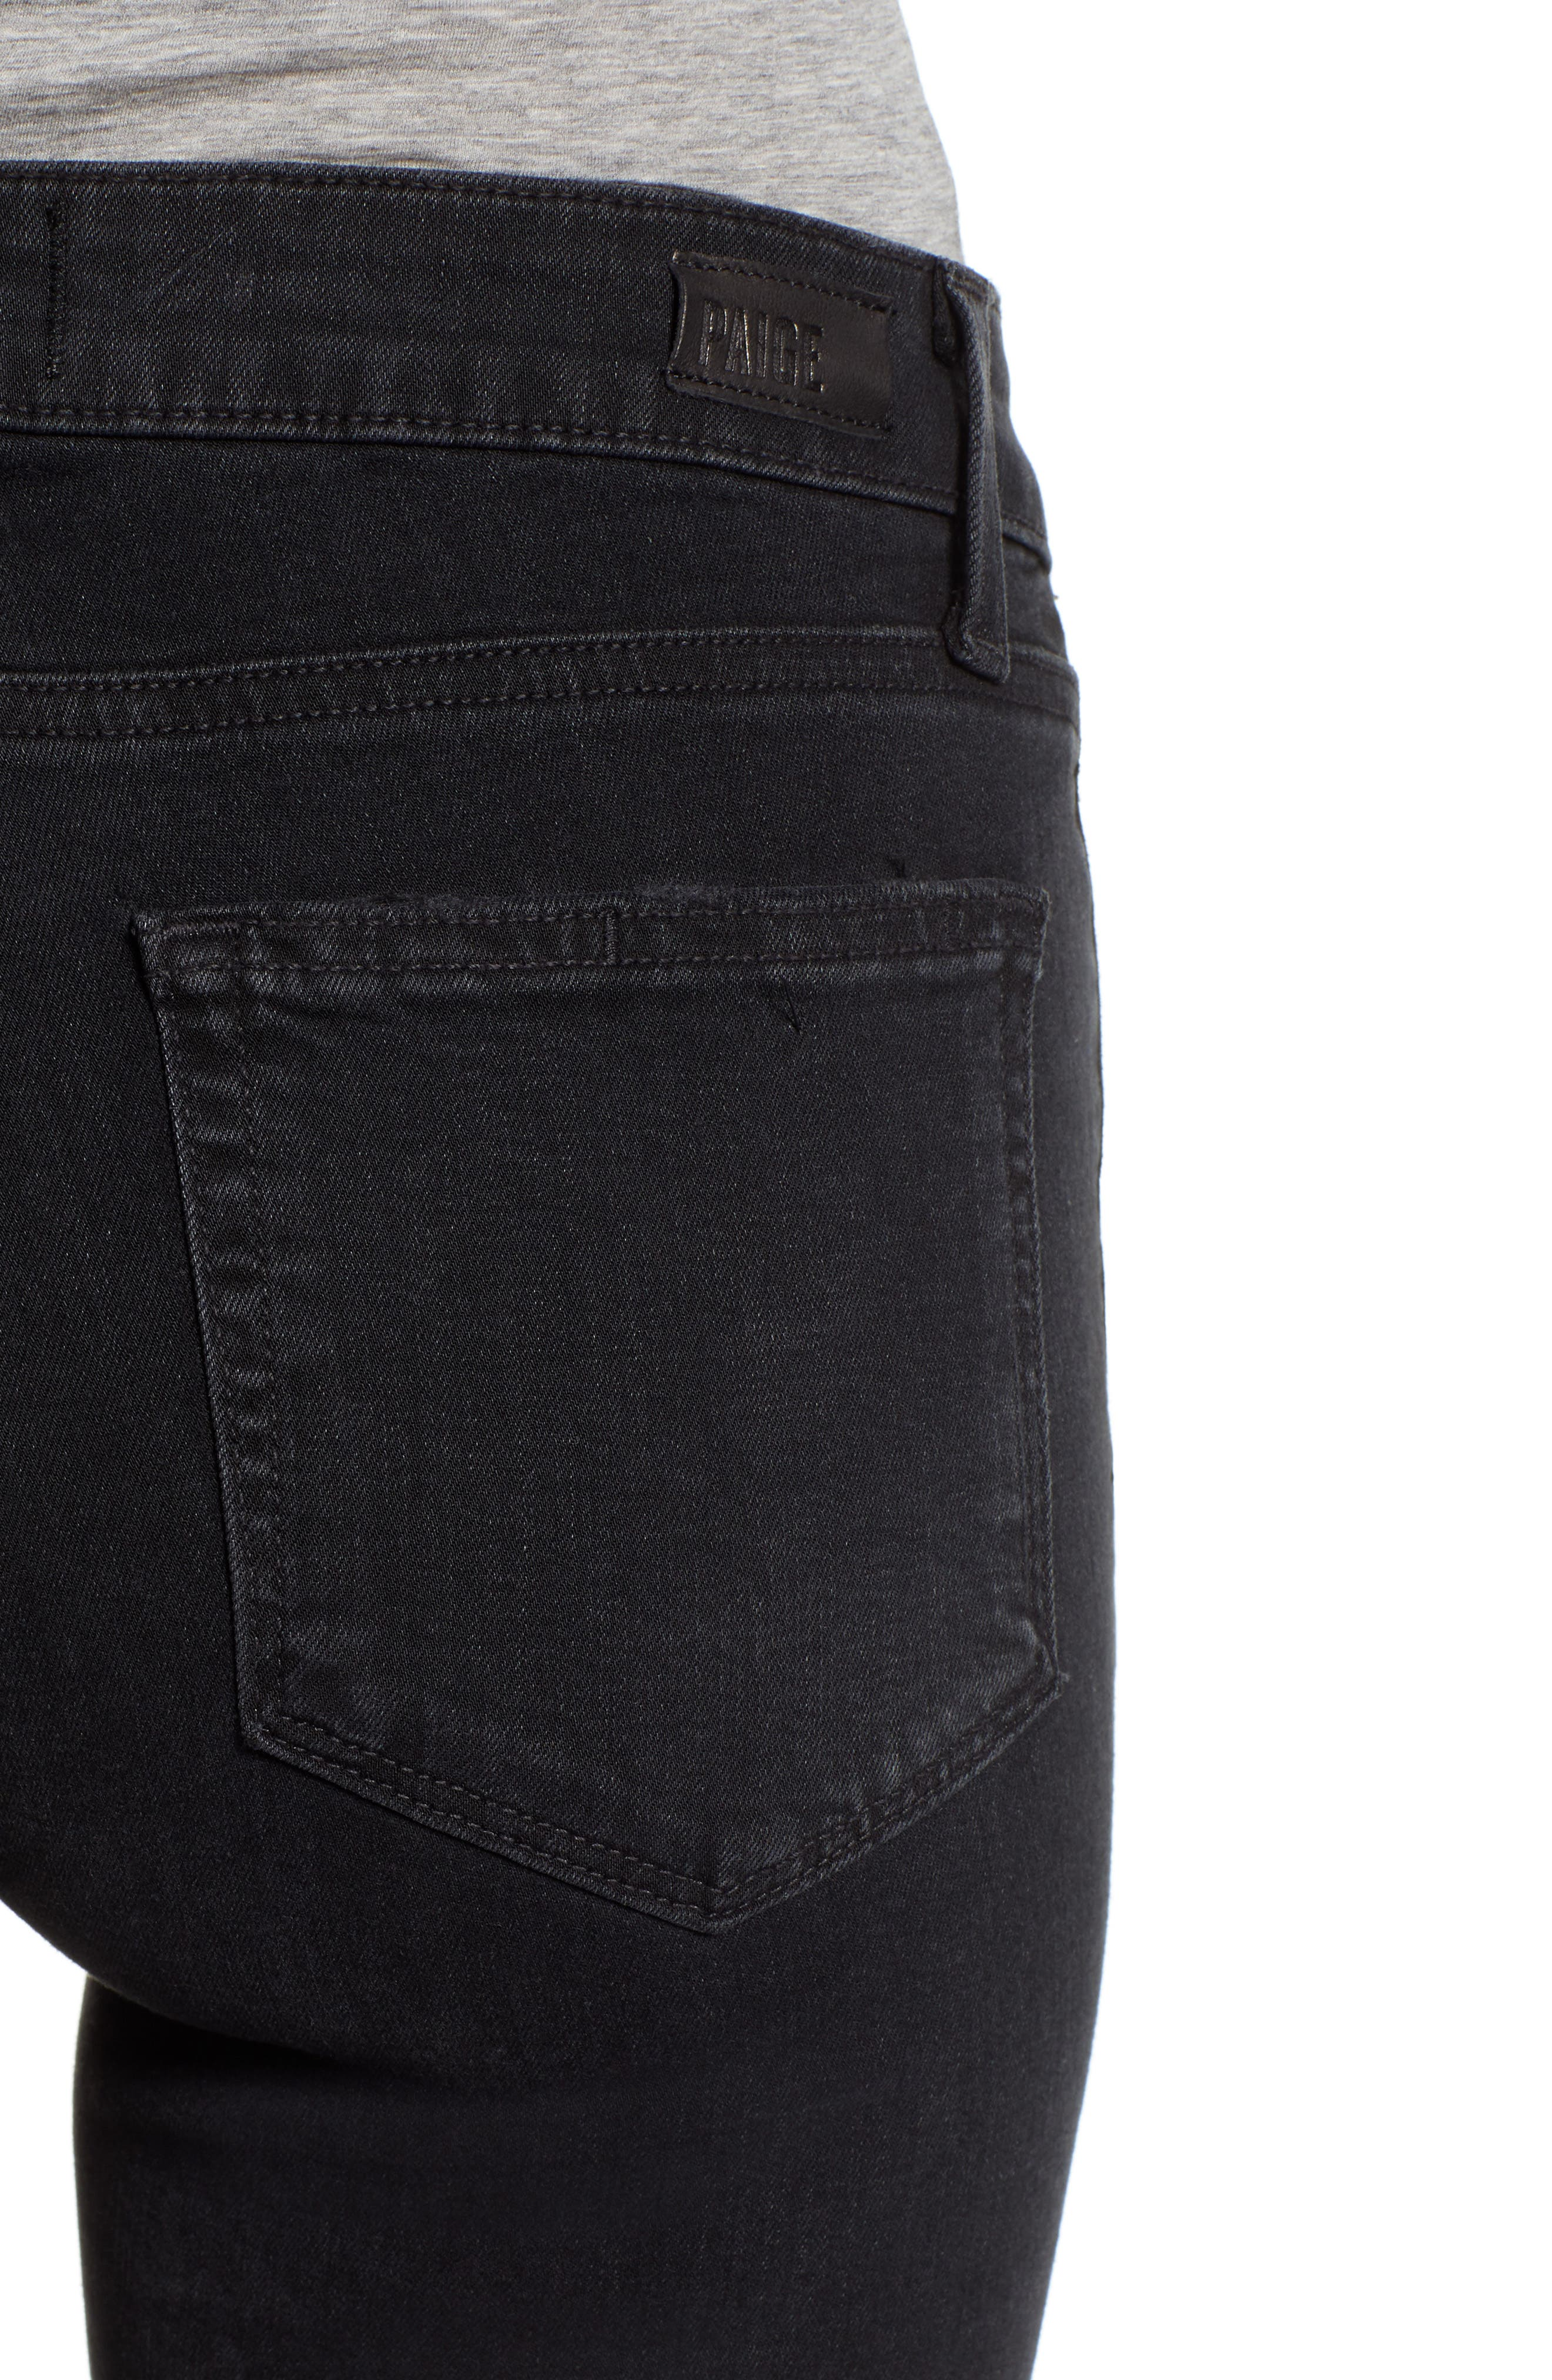 PAIGE, Transcend - Verdugo Ankle Skinny Jeans, Alternate thumbnail 5, color, 001